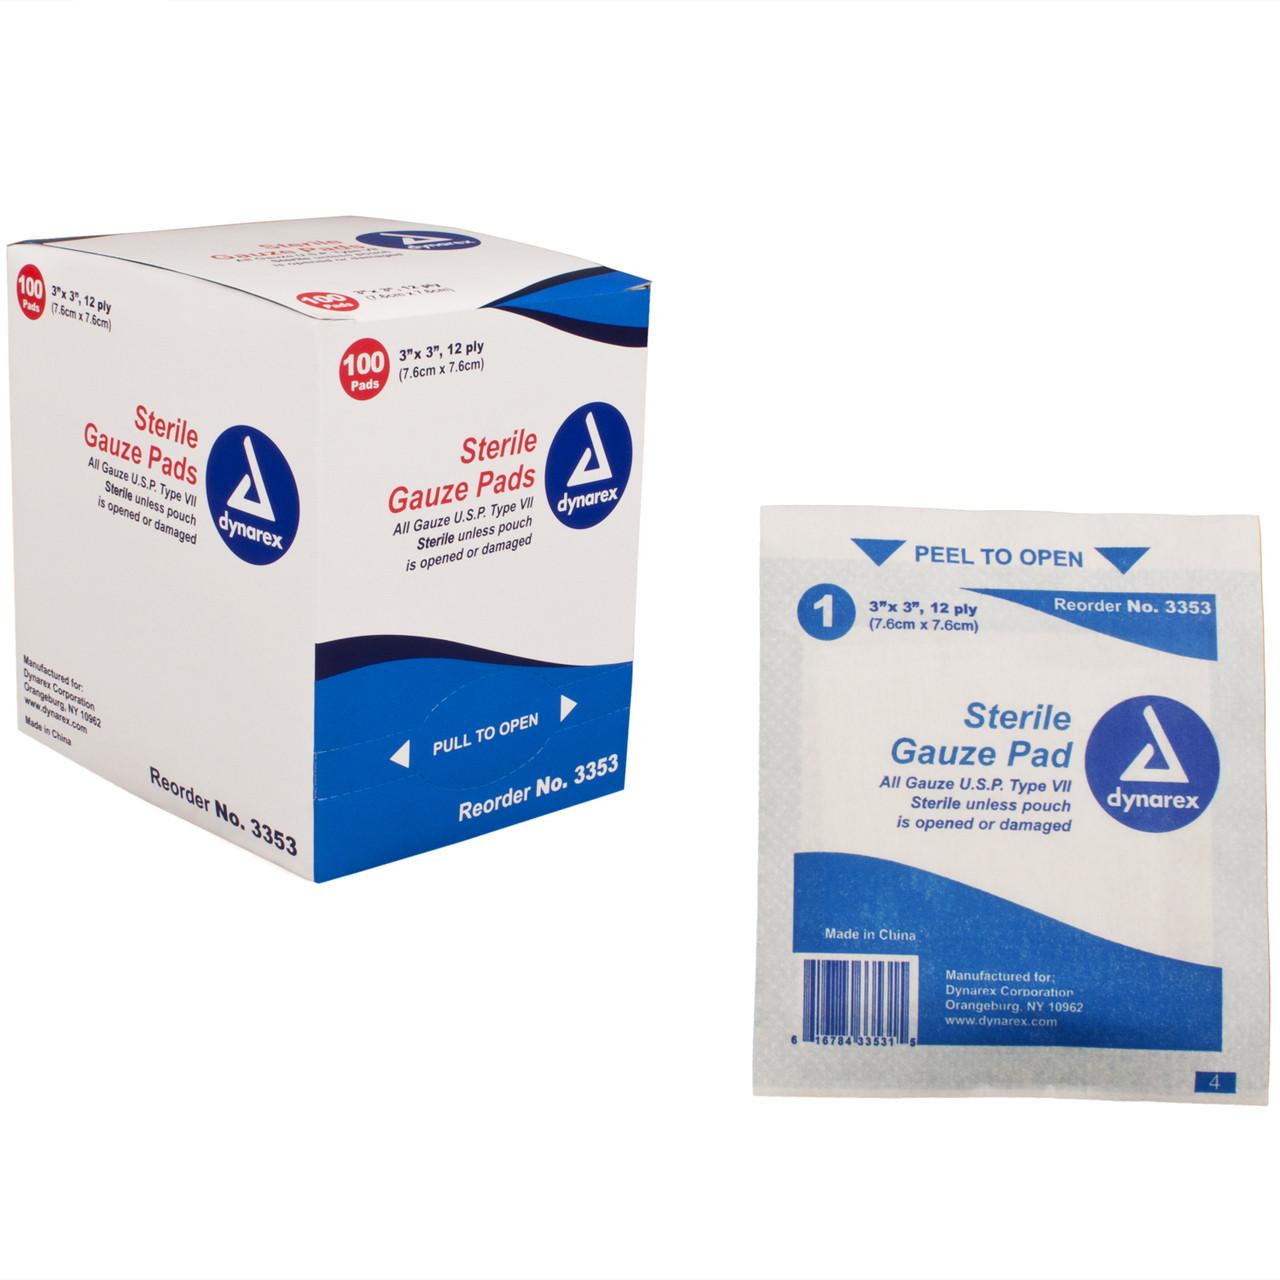 Sterile Gauze Pads - 3'' x 3'' - 100 per Box